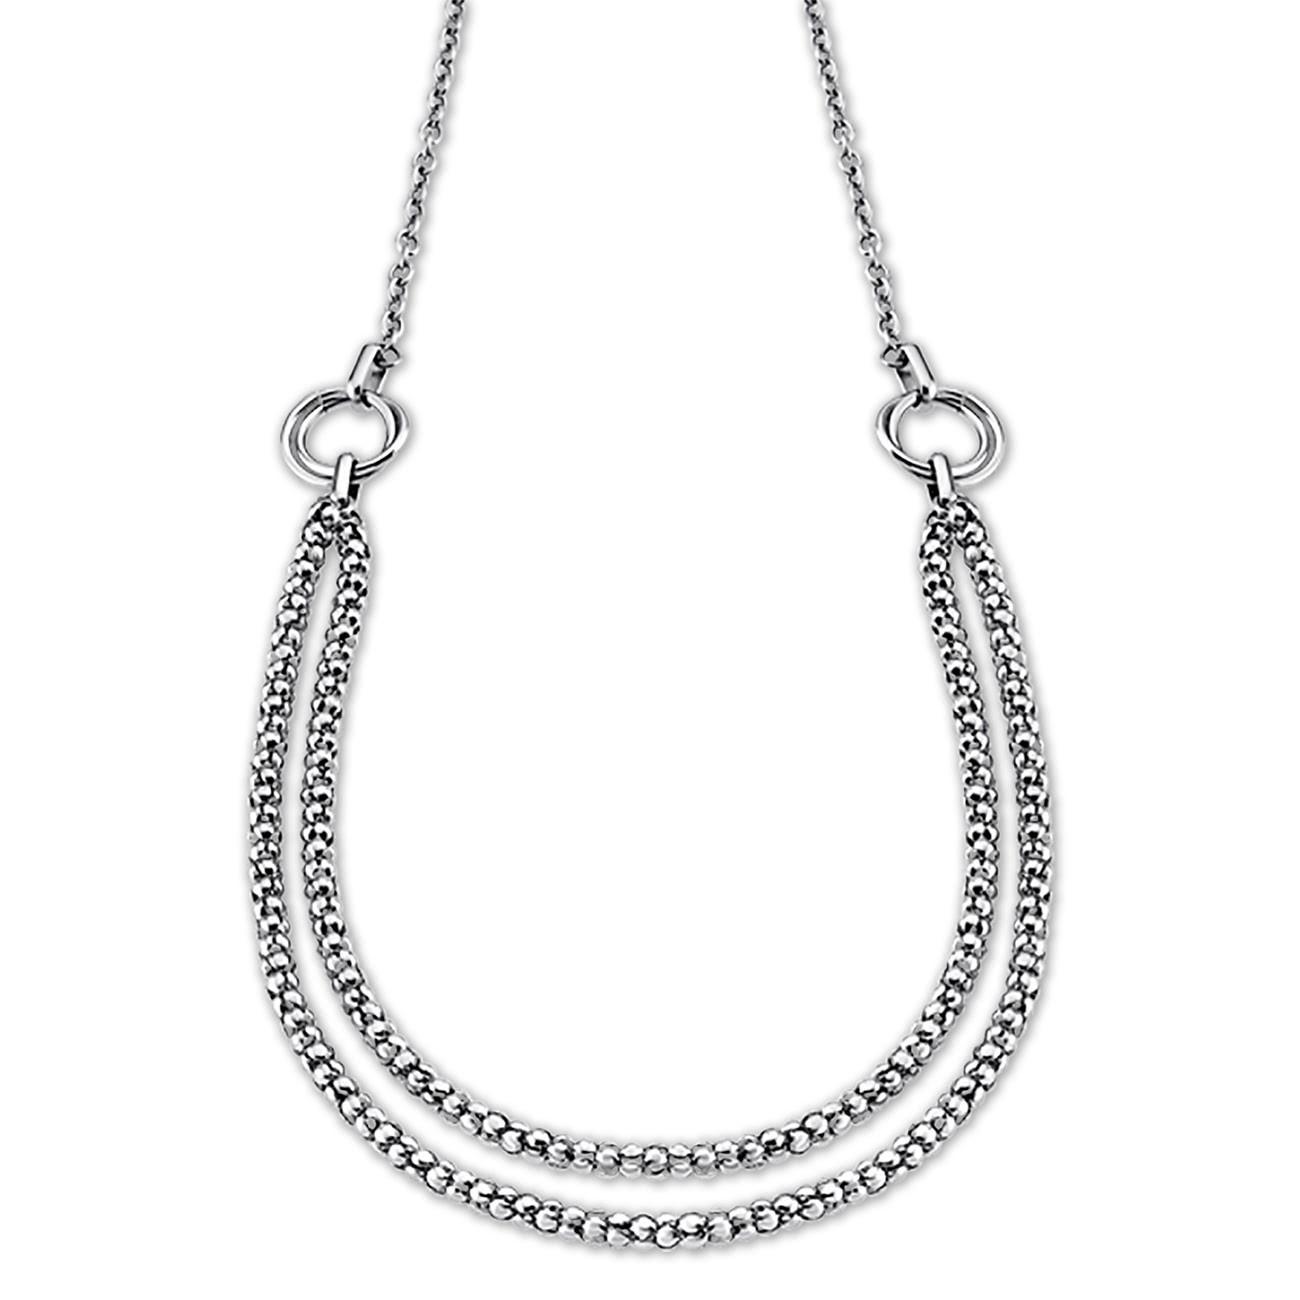 LOTUS Style Halskette Damen Edelstahl silber LS1818-1/1 Woman JLS1818-1-1